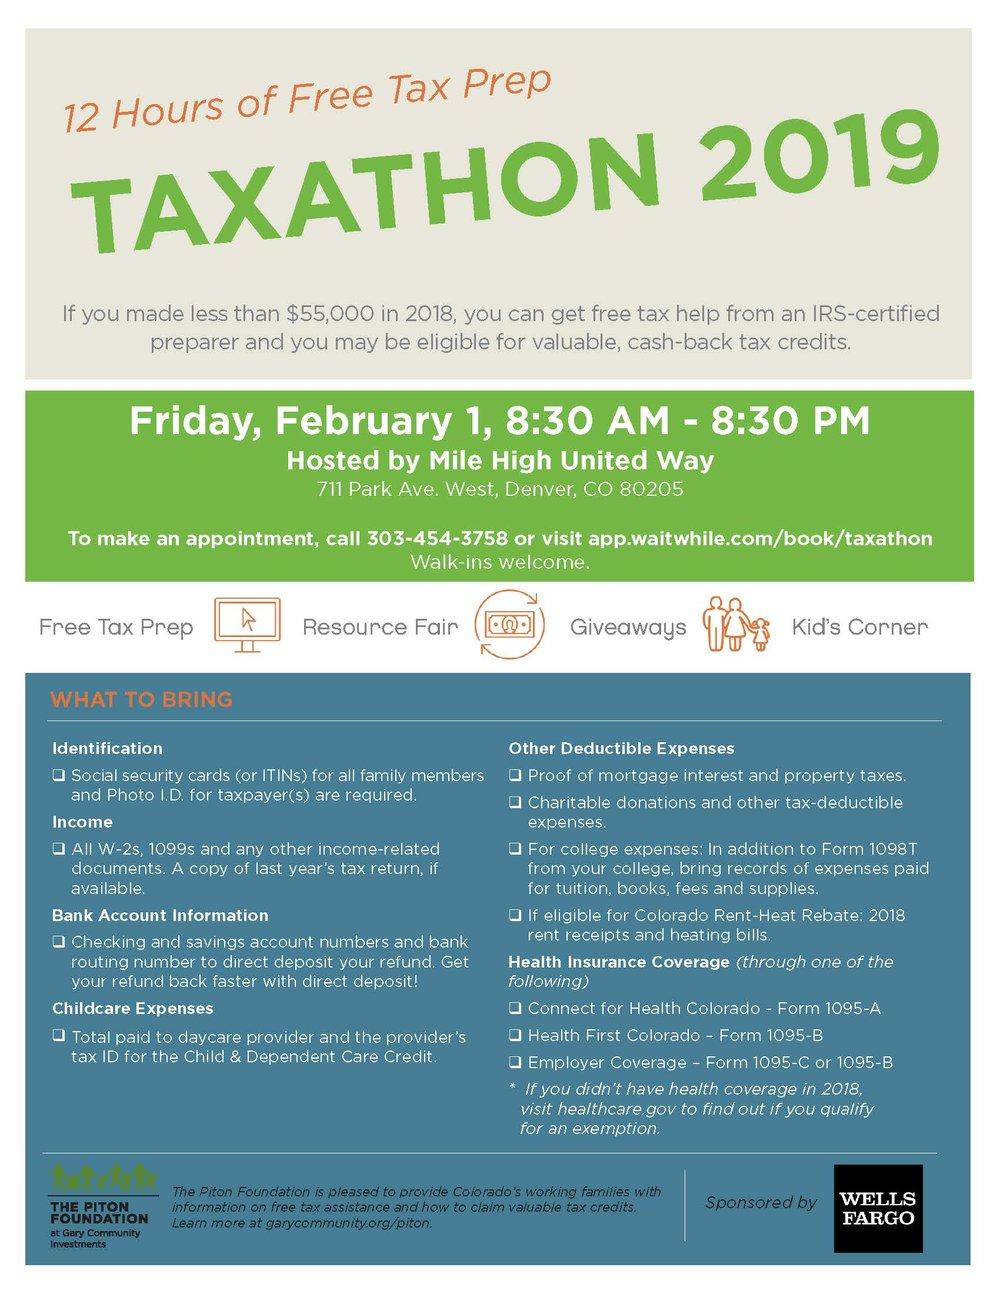 Taxathon 2019 — Arapahoe County Early Childhood Council